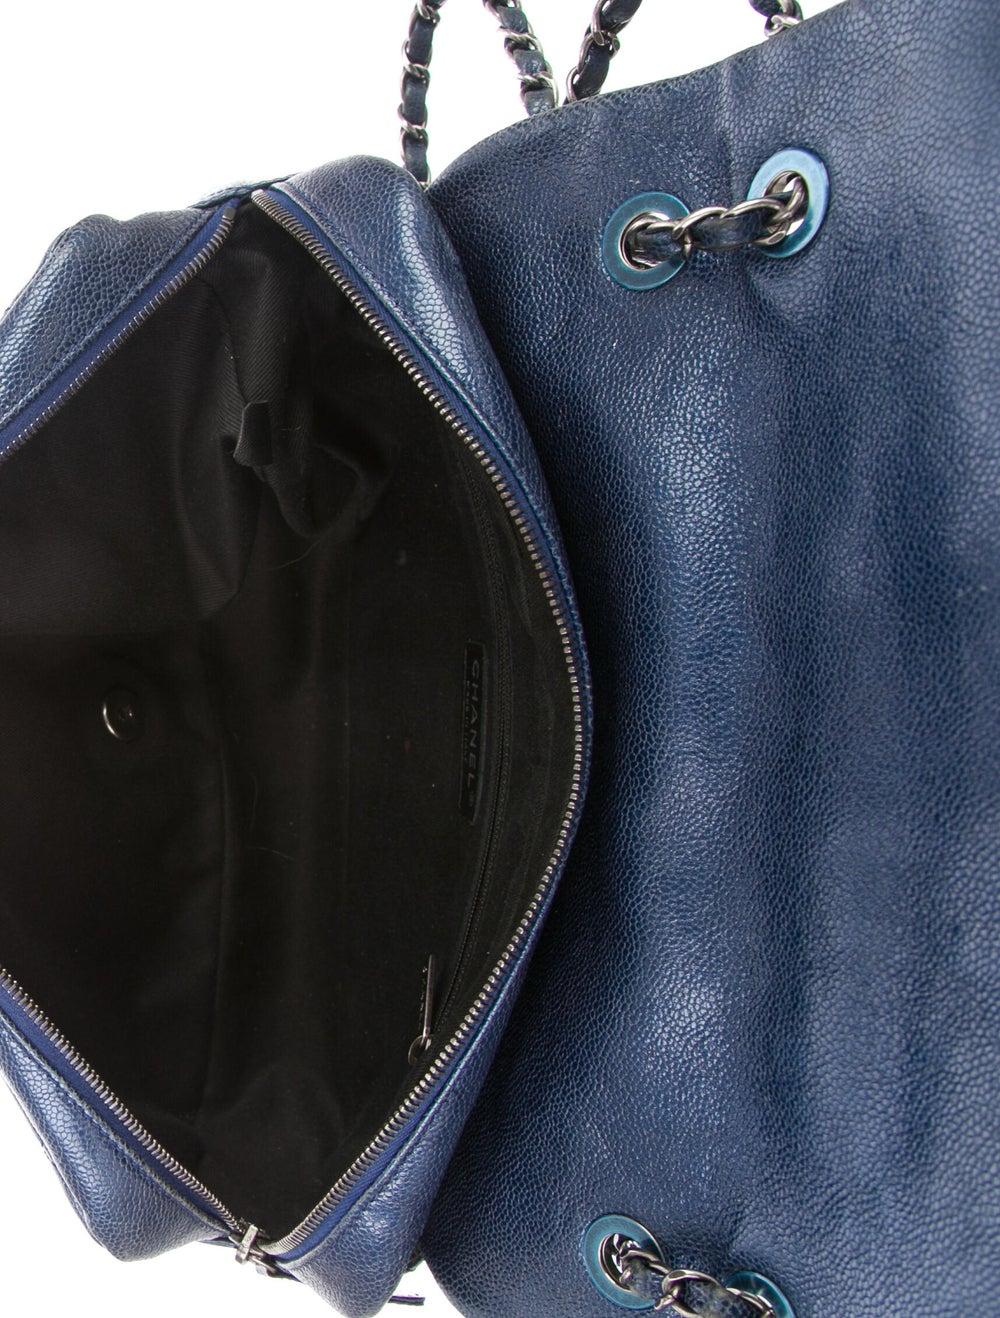 Chanel Jumbo Easy Caviar Flap Bag Blue - image 5